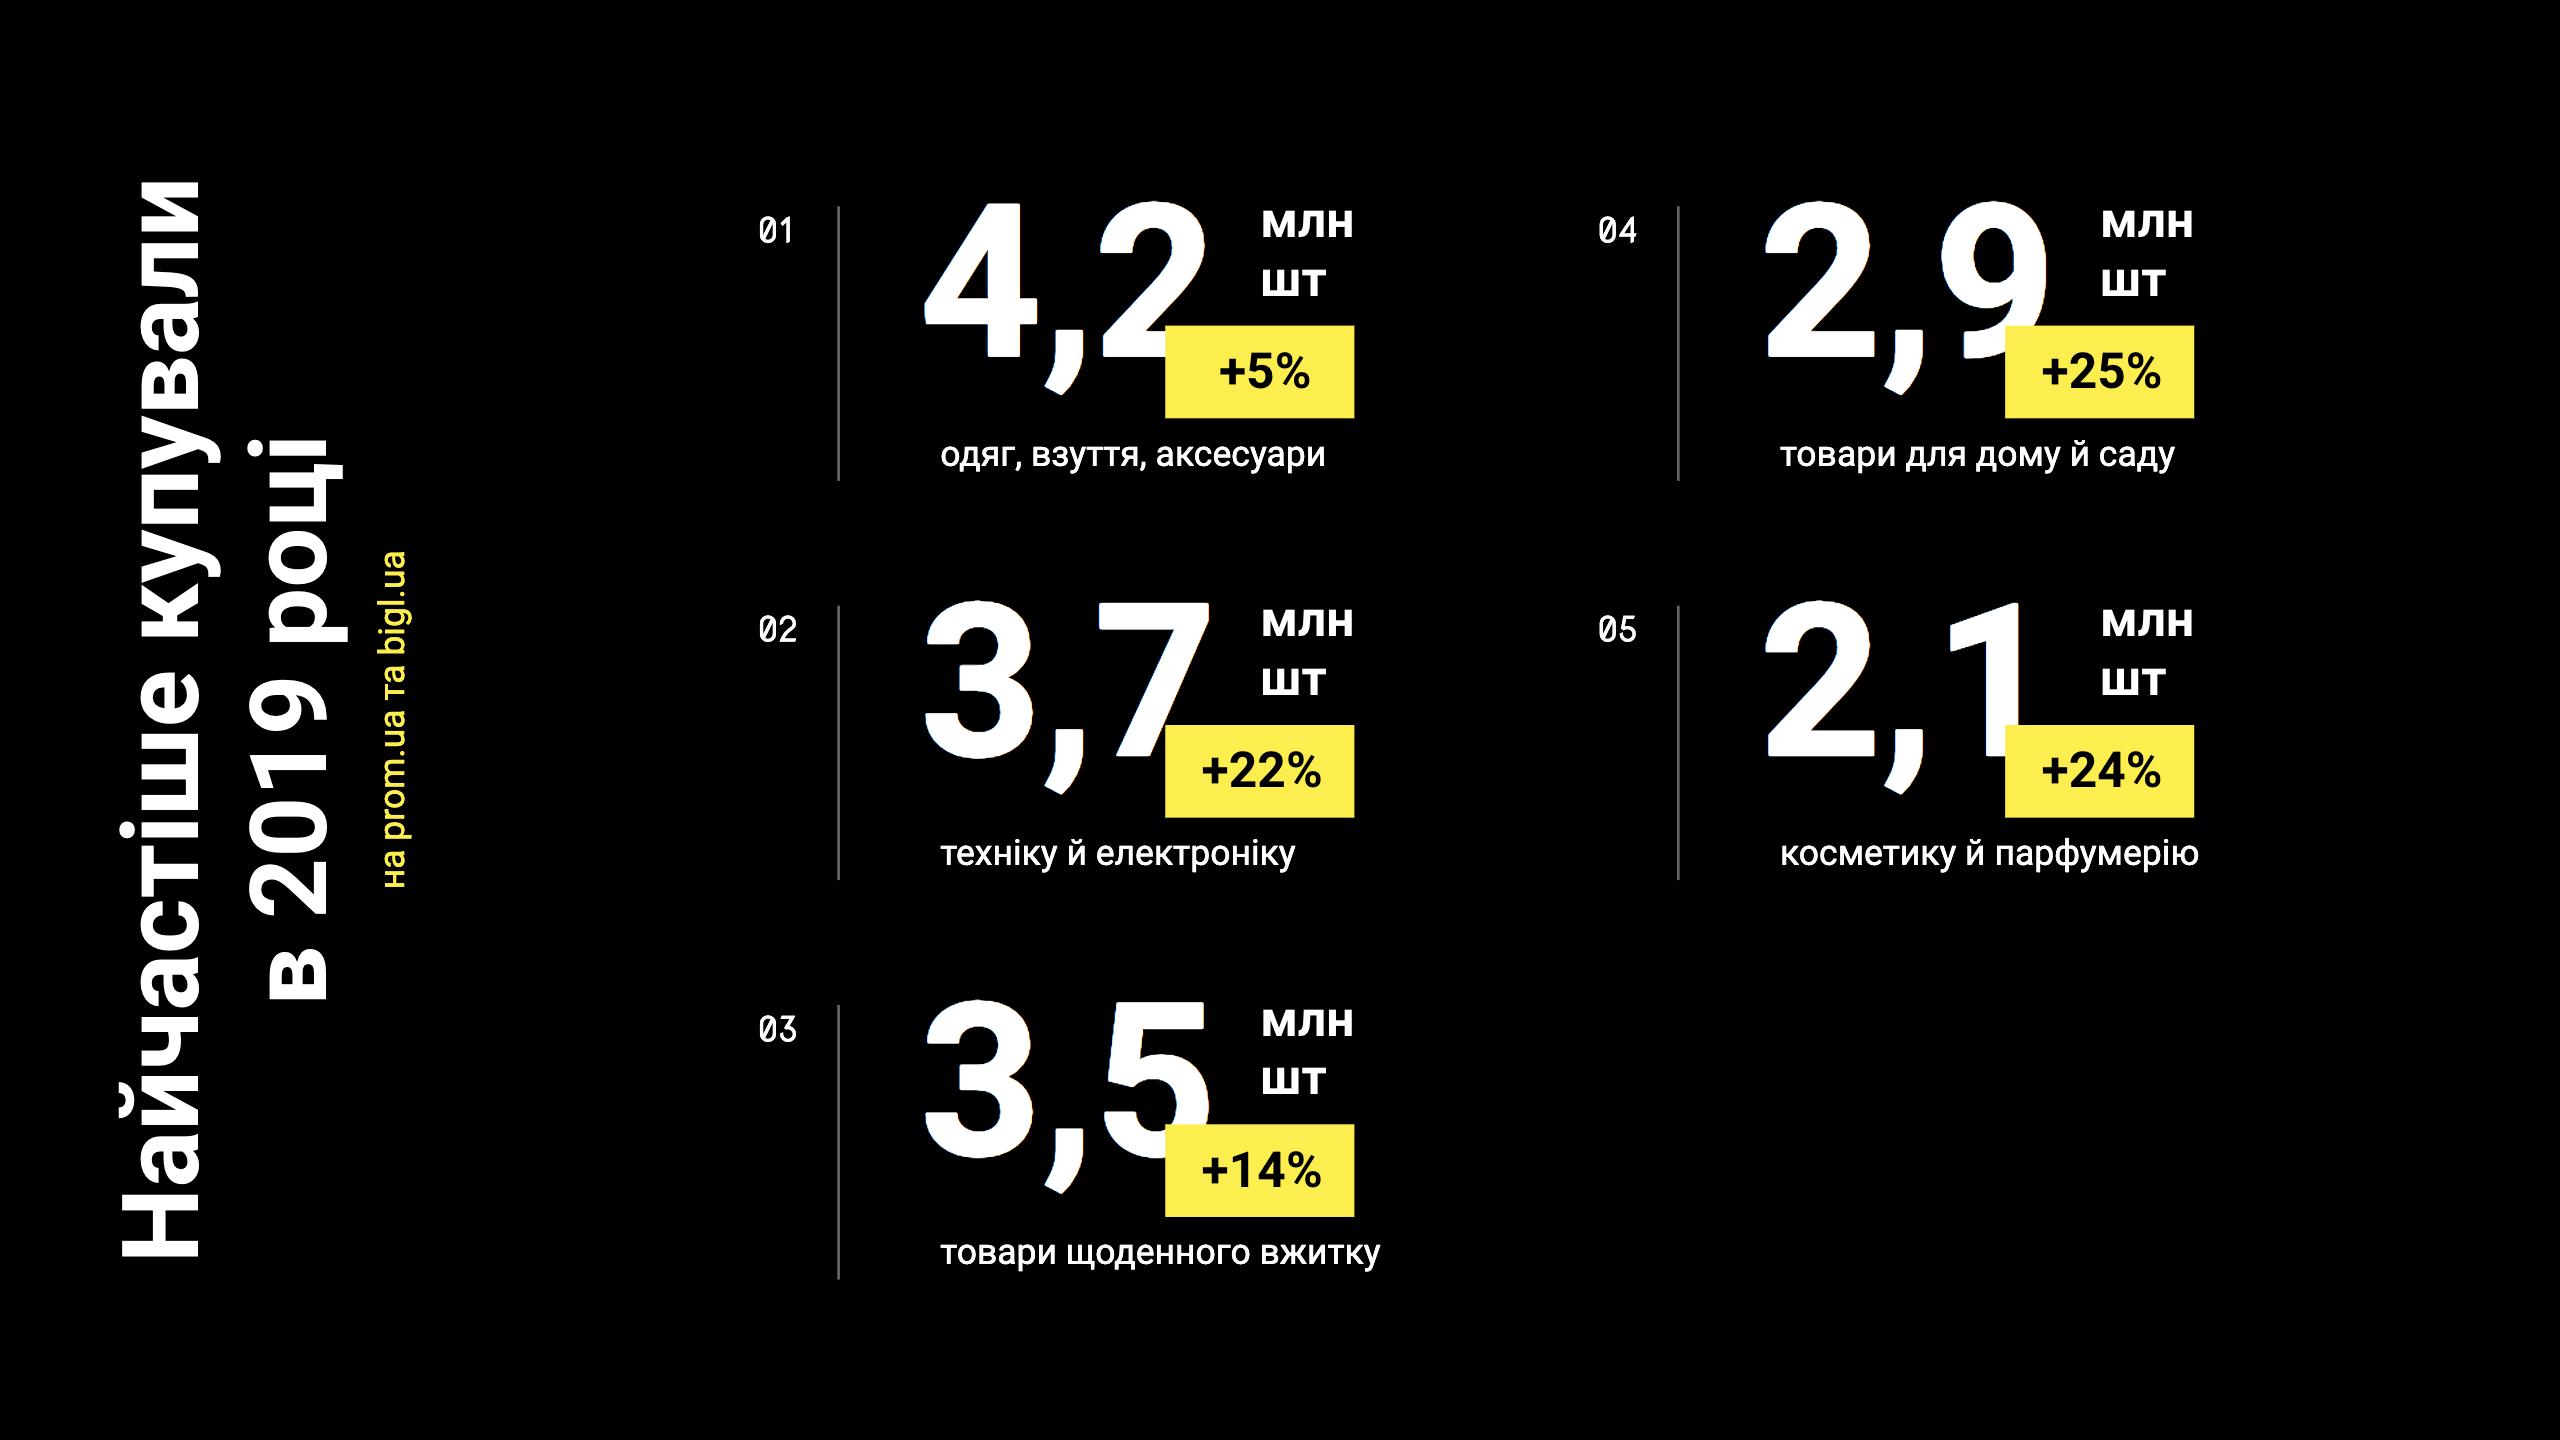 Объем украинского ecommerce-рынка в 2019 году и прогноз на 2020 год - оценка EVO